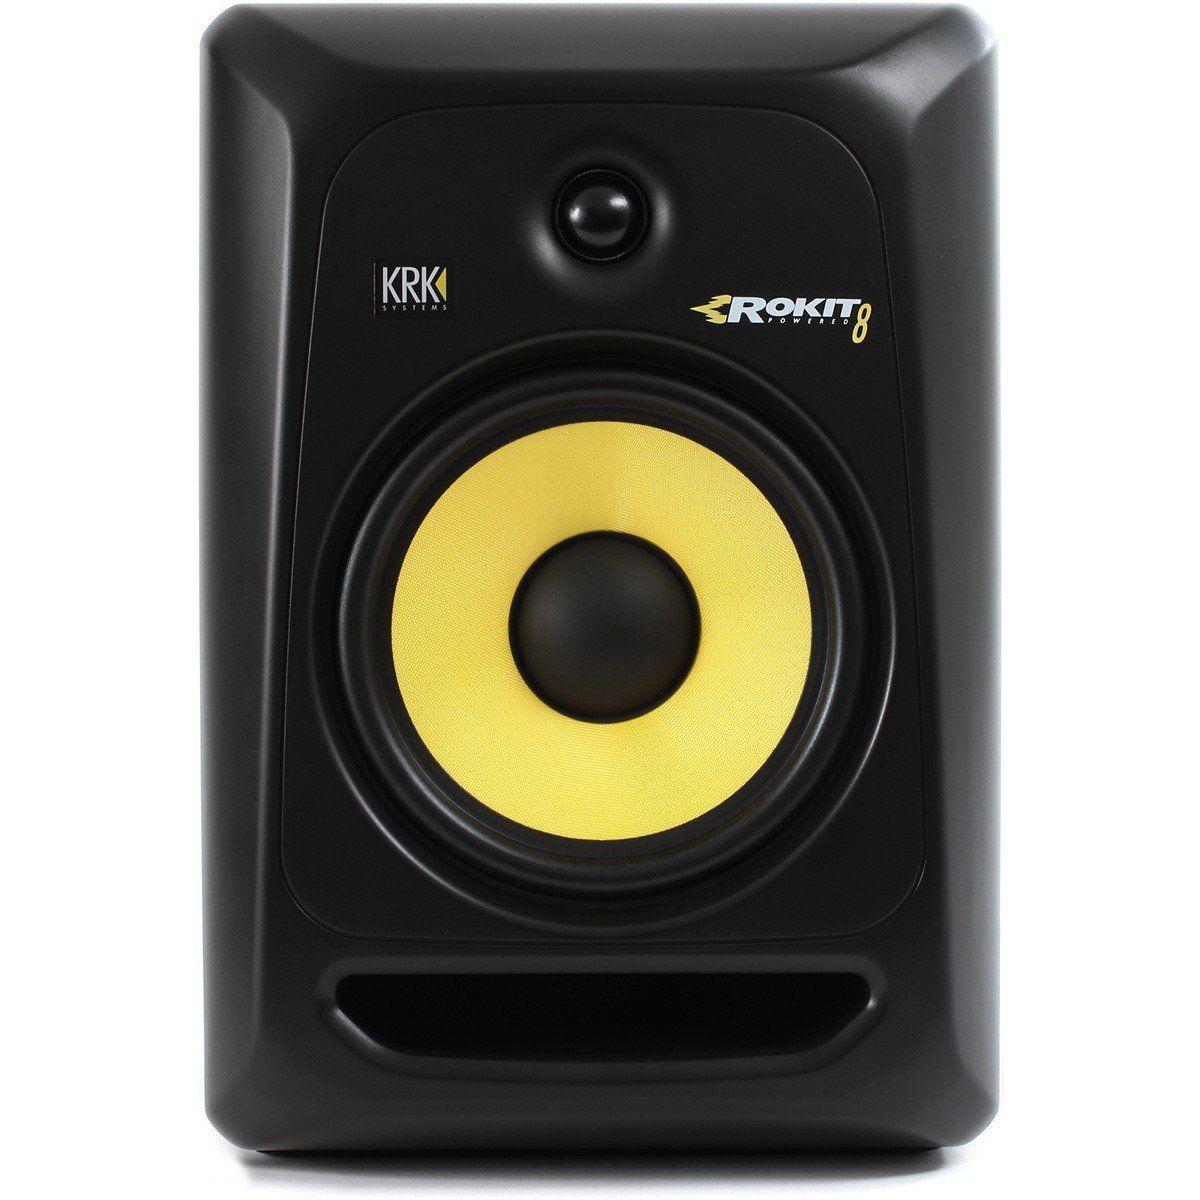 Krk RP8 G3 Rokit Monitor de Áudio Krk RP8G3 Rokit para Estúdio Monitor de Referência